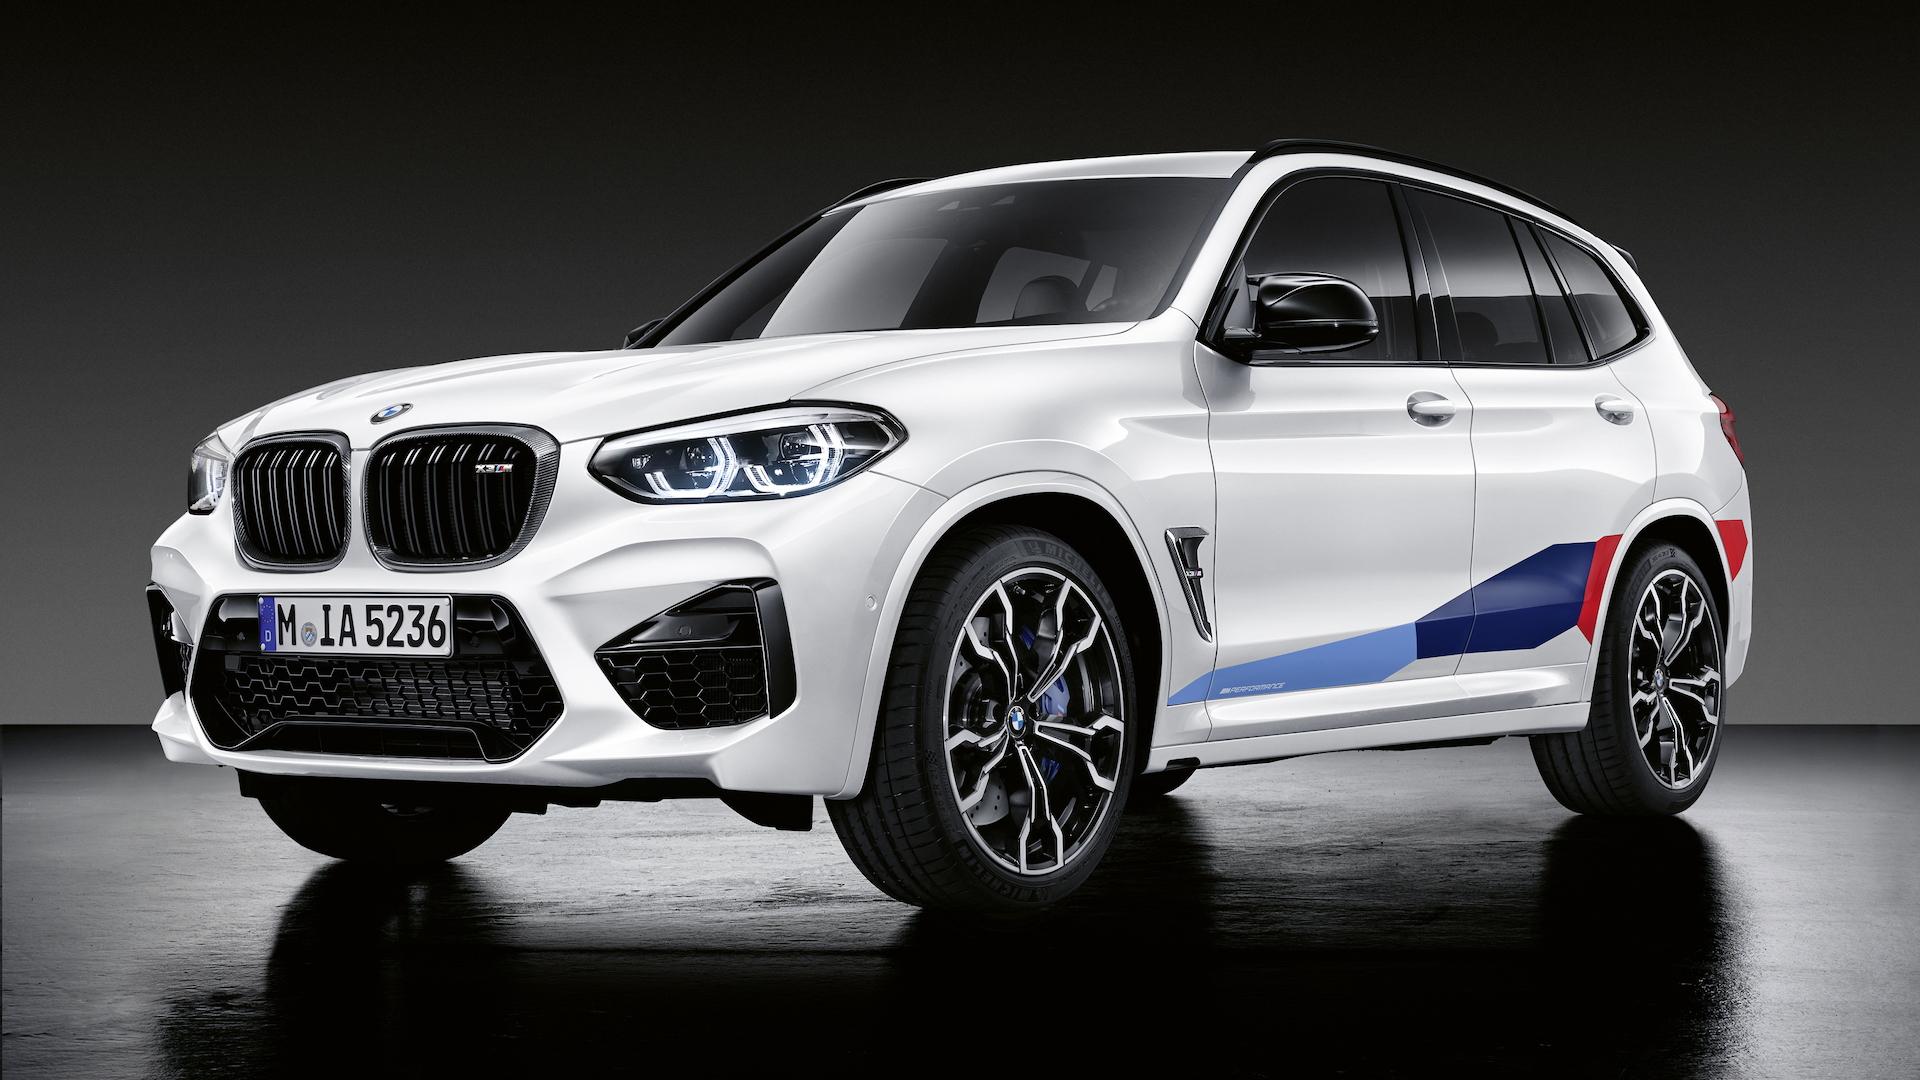 BMW M Performance parts for X3 M, X4 M